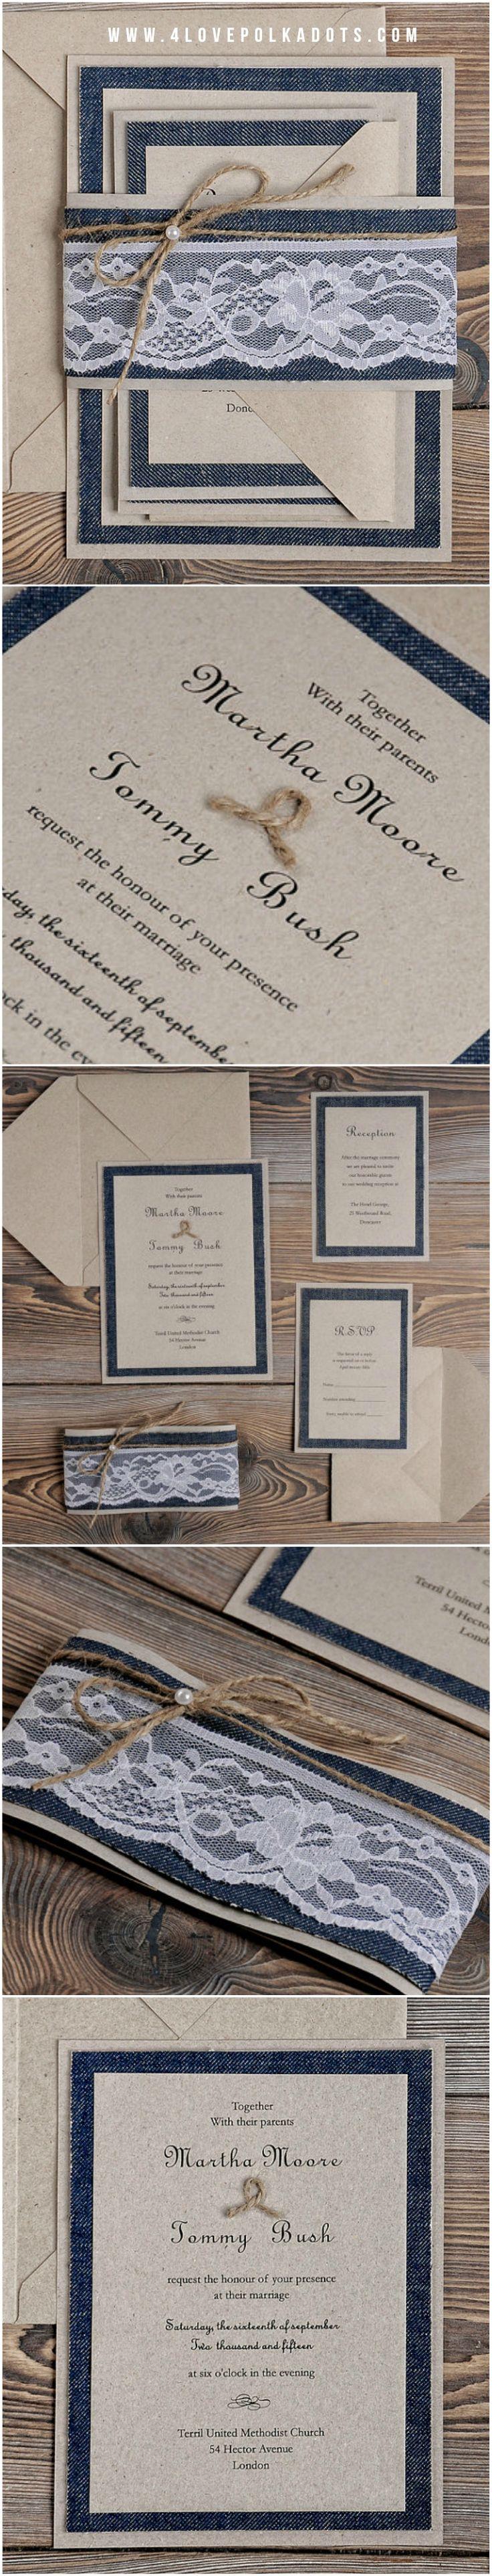 diamond wedding invitations%0A Jeans  u     Lace Wedding Invitation  eco kraft paper  lace and twine  jeans